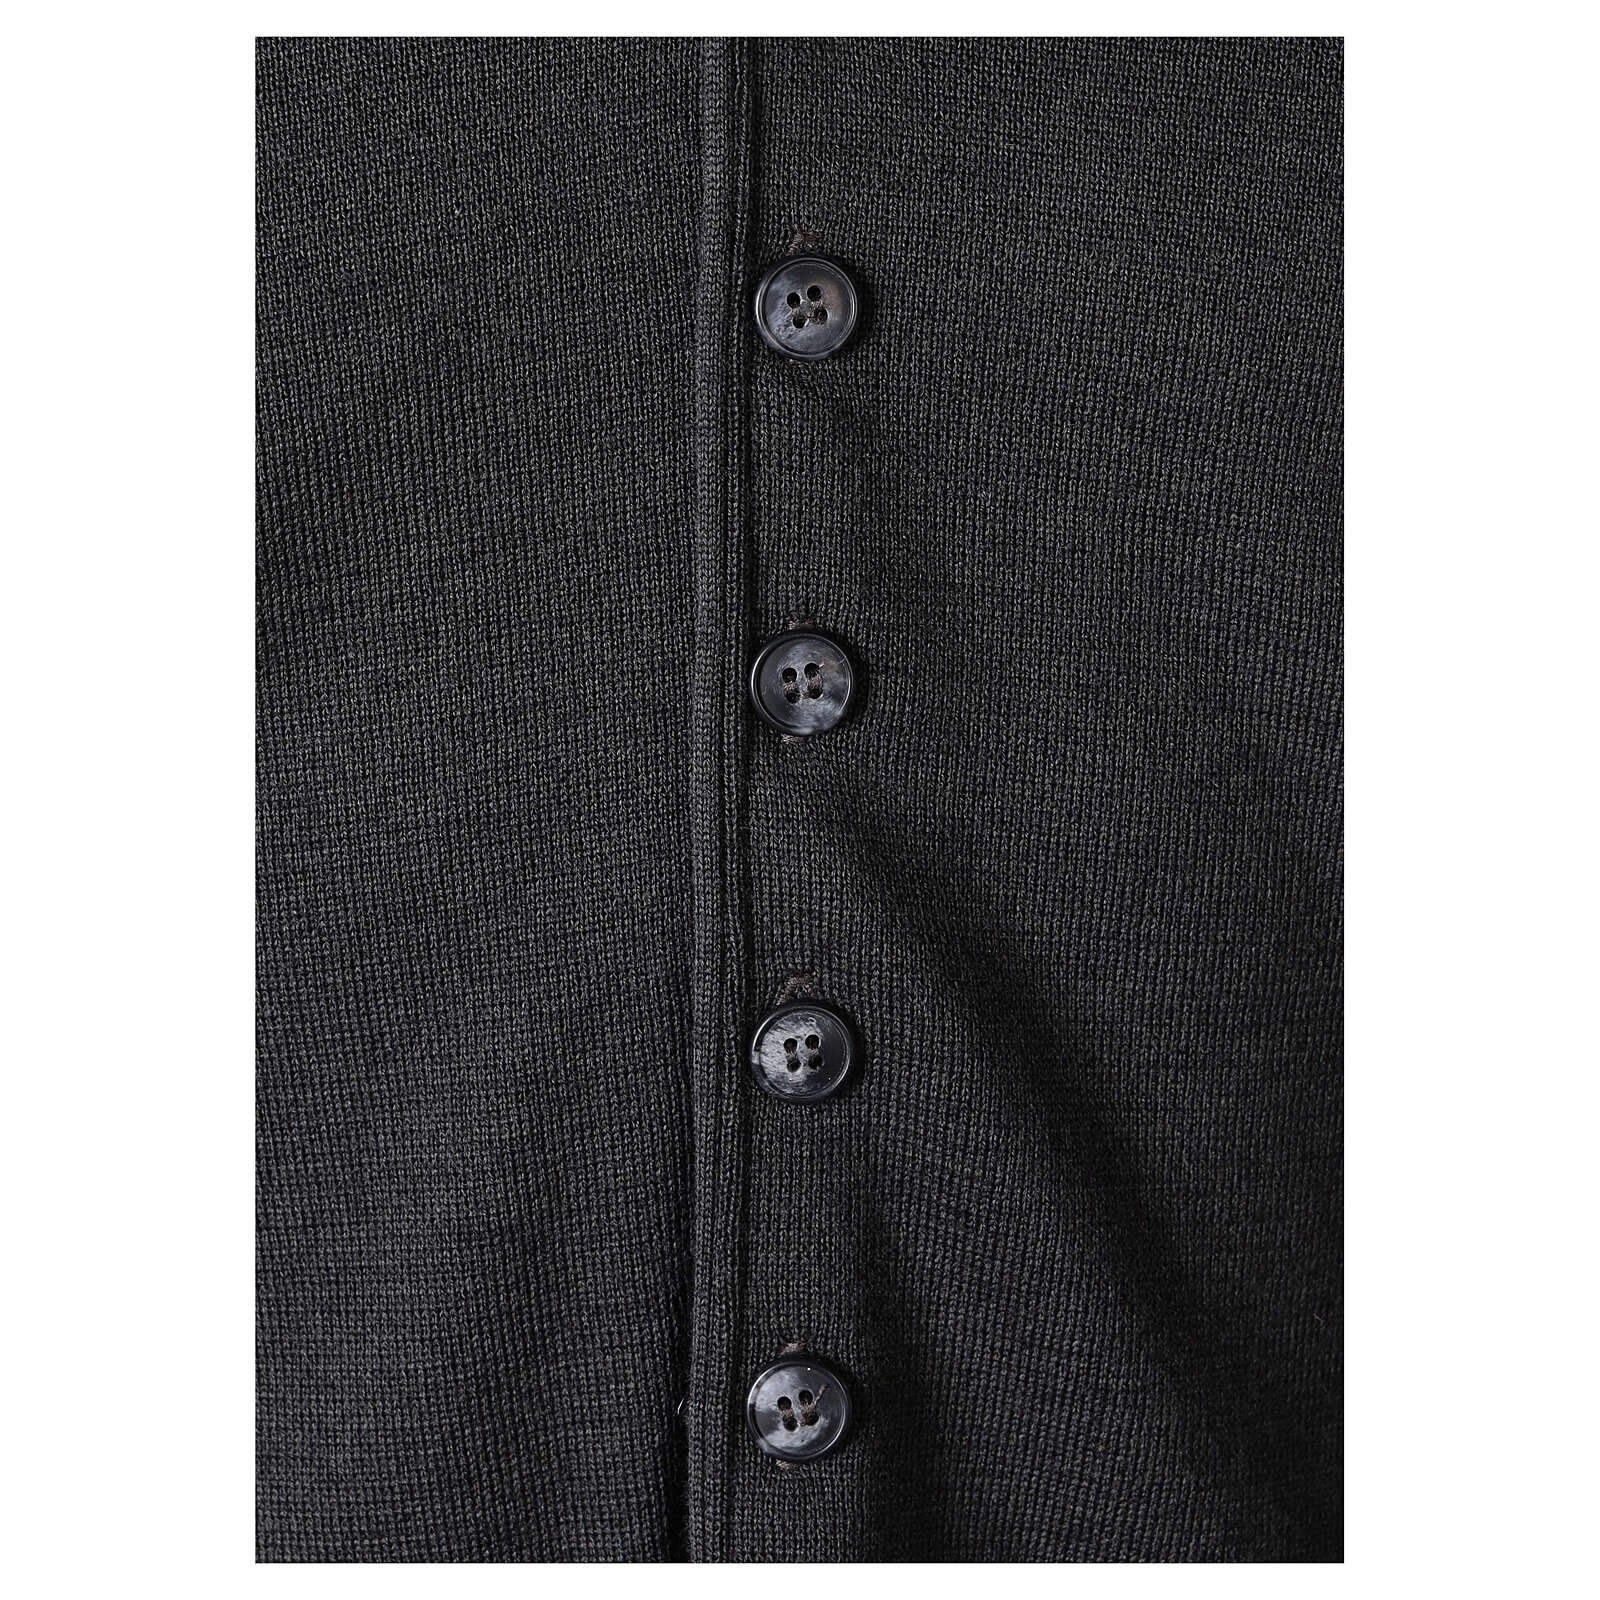 Clergy sleeveless grey cardigan 50% merino wool 50% acrylic In Primis 4